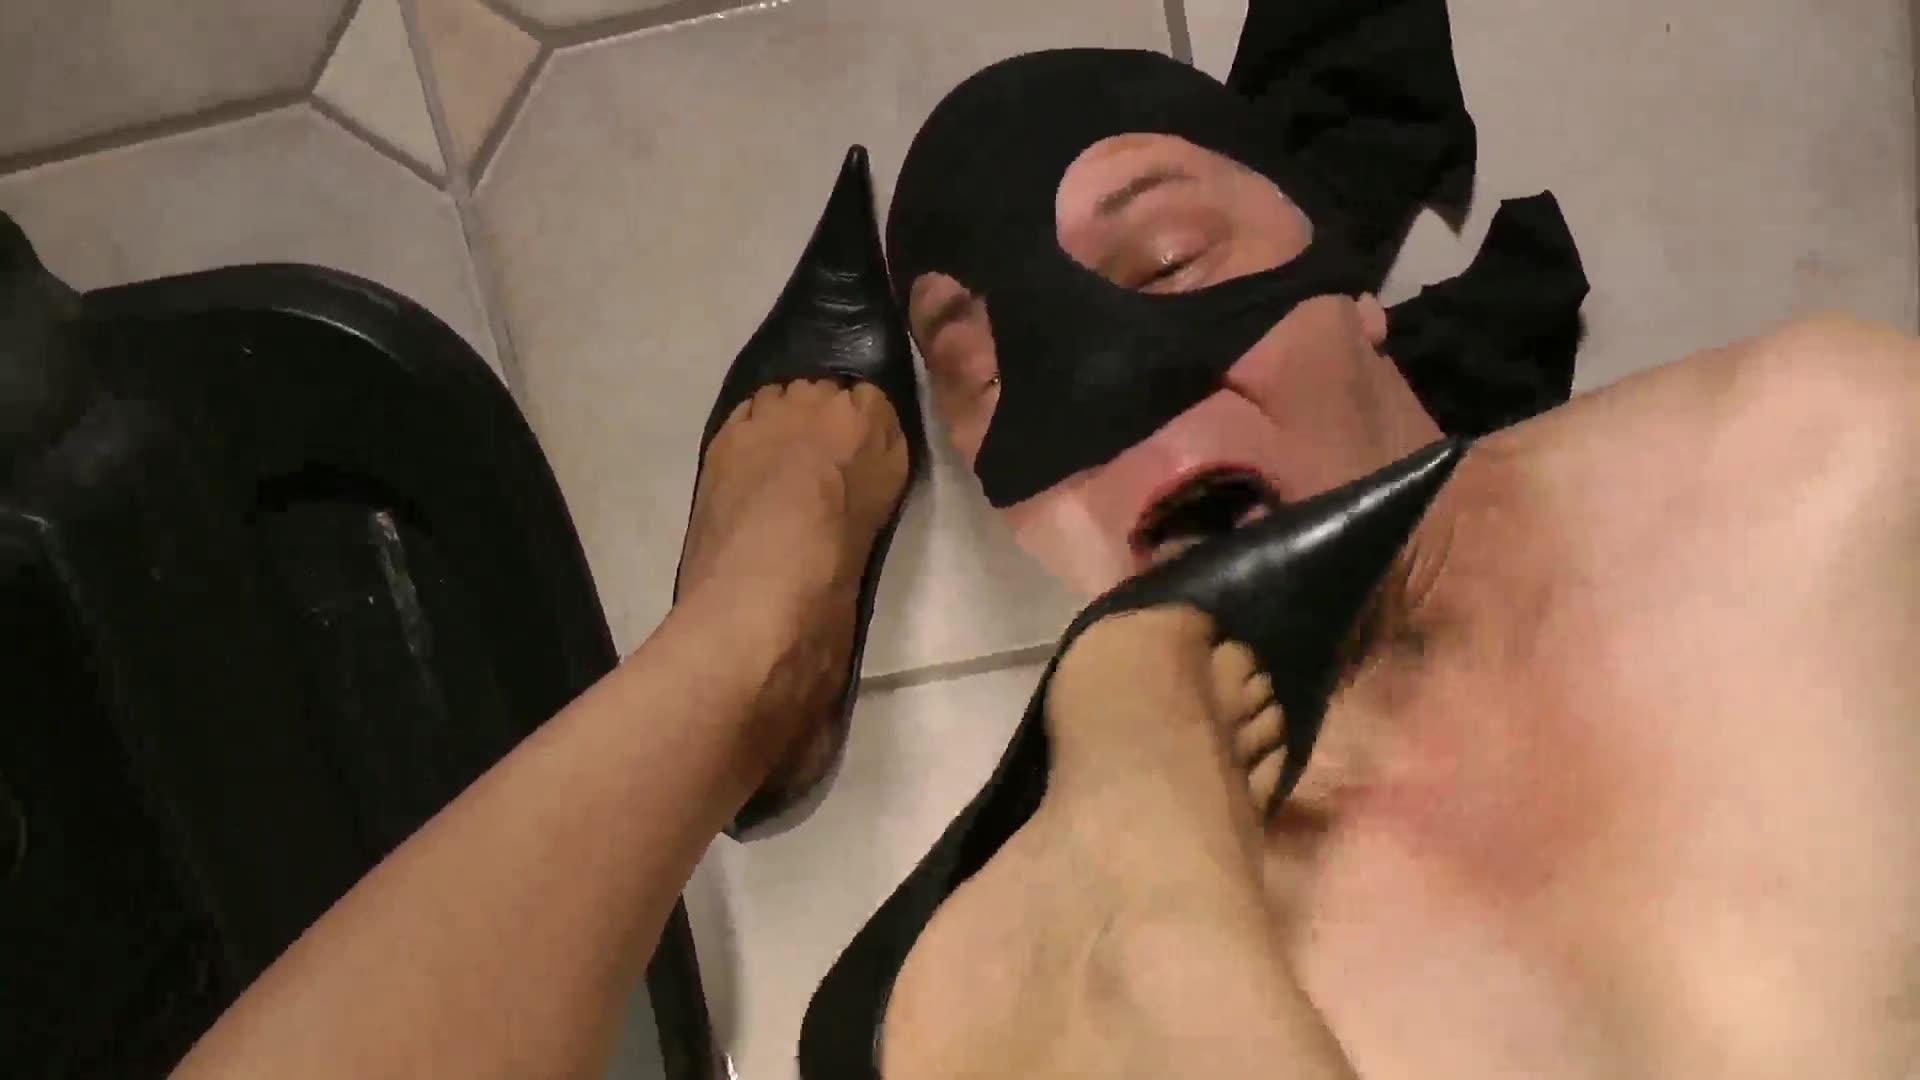 Top view angle high, heels and bare feet deep throat men